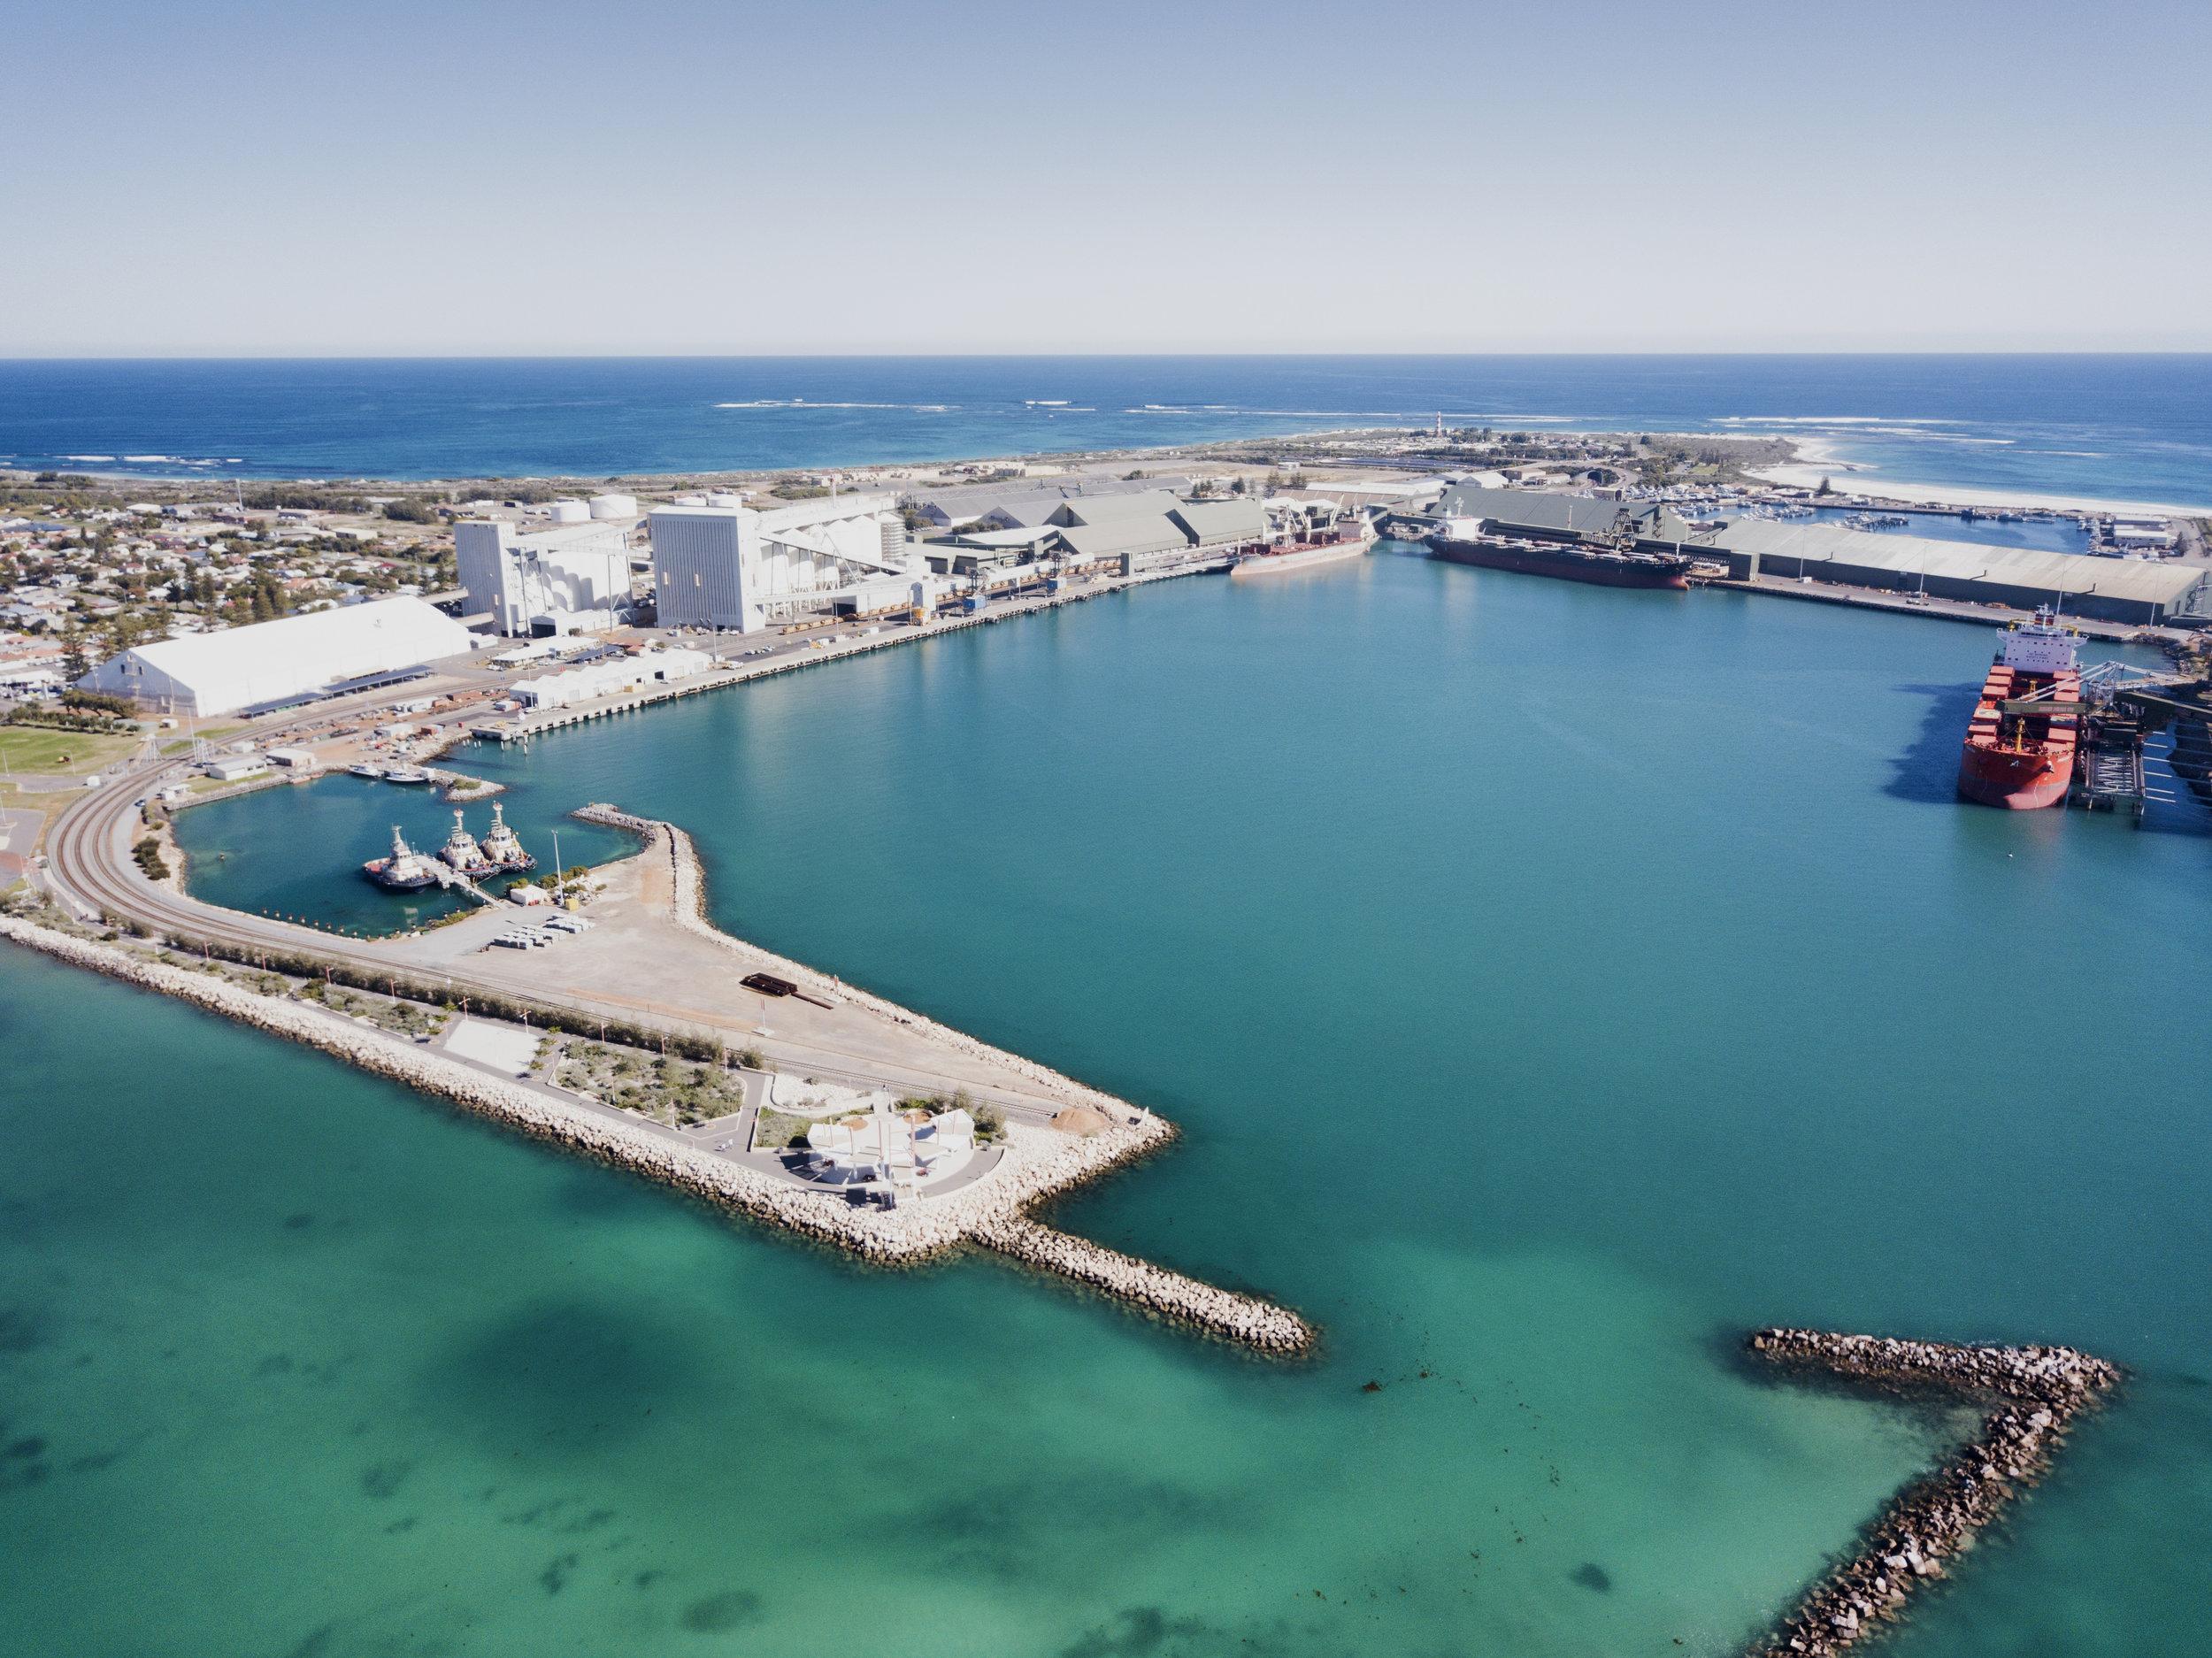 Aerial shot of the Port of Geraldton Credit: Joshua Miles